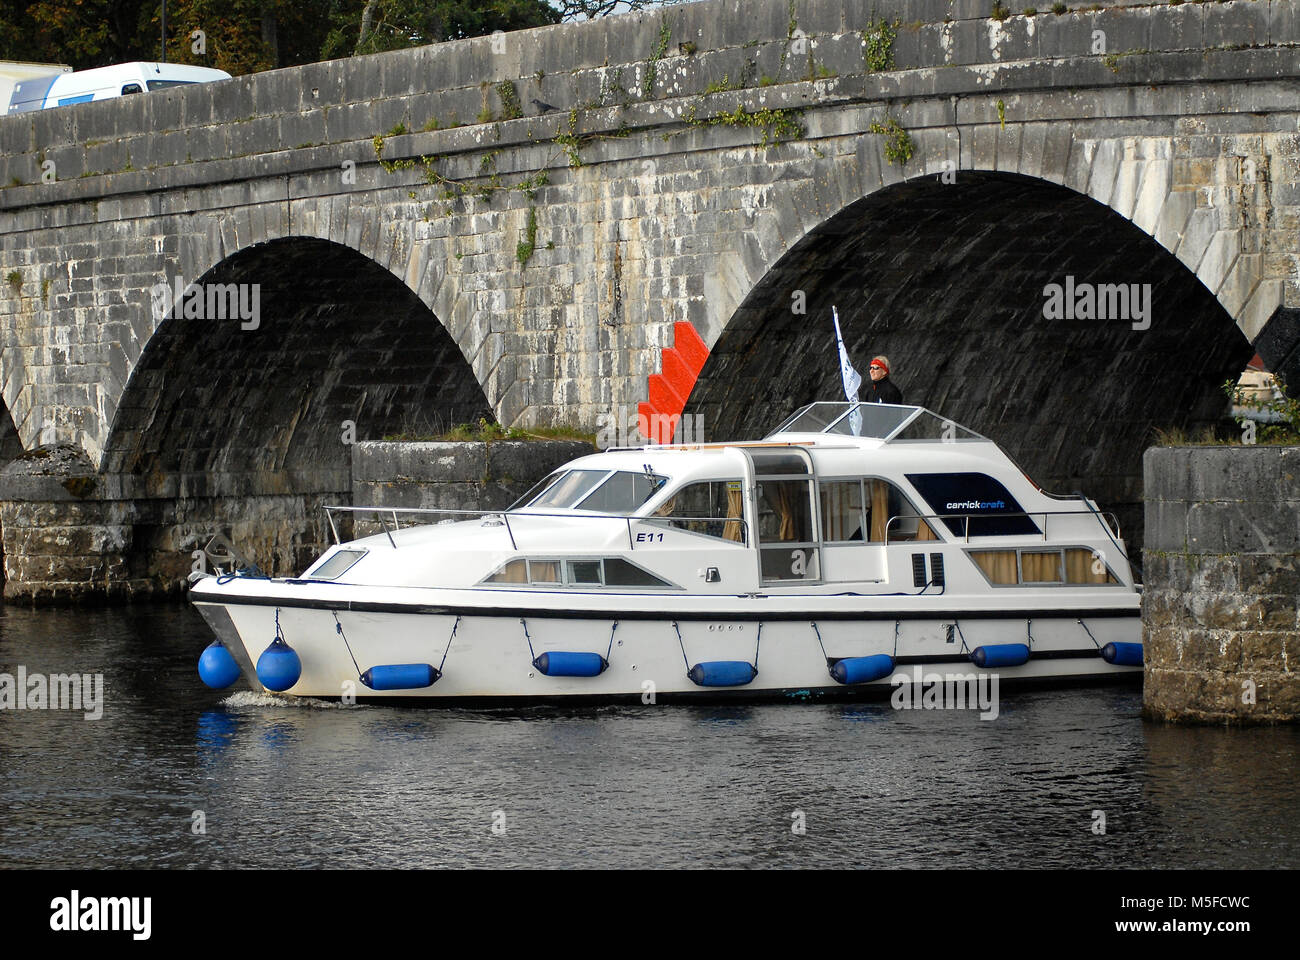 Leitrim stock photos leitrim stock images alamy for Wild river motor lodge